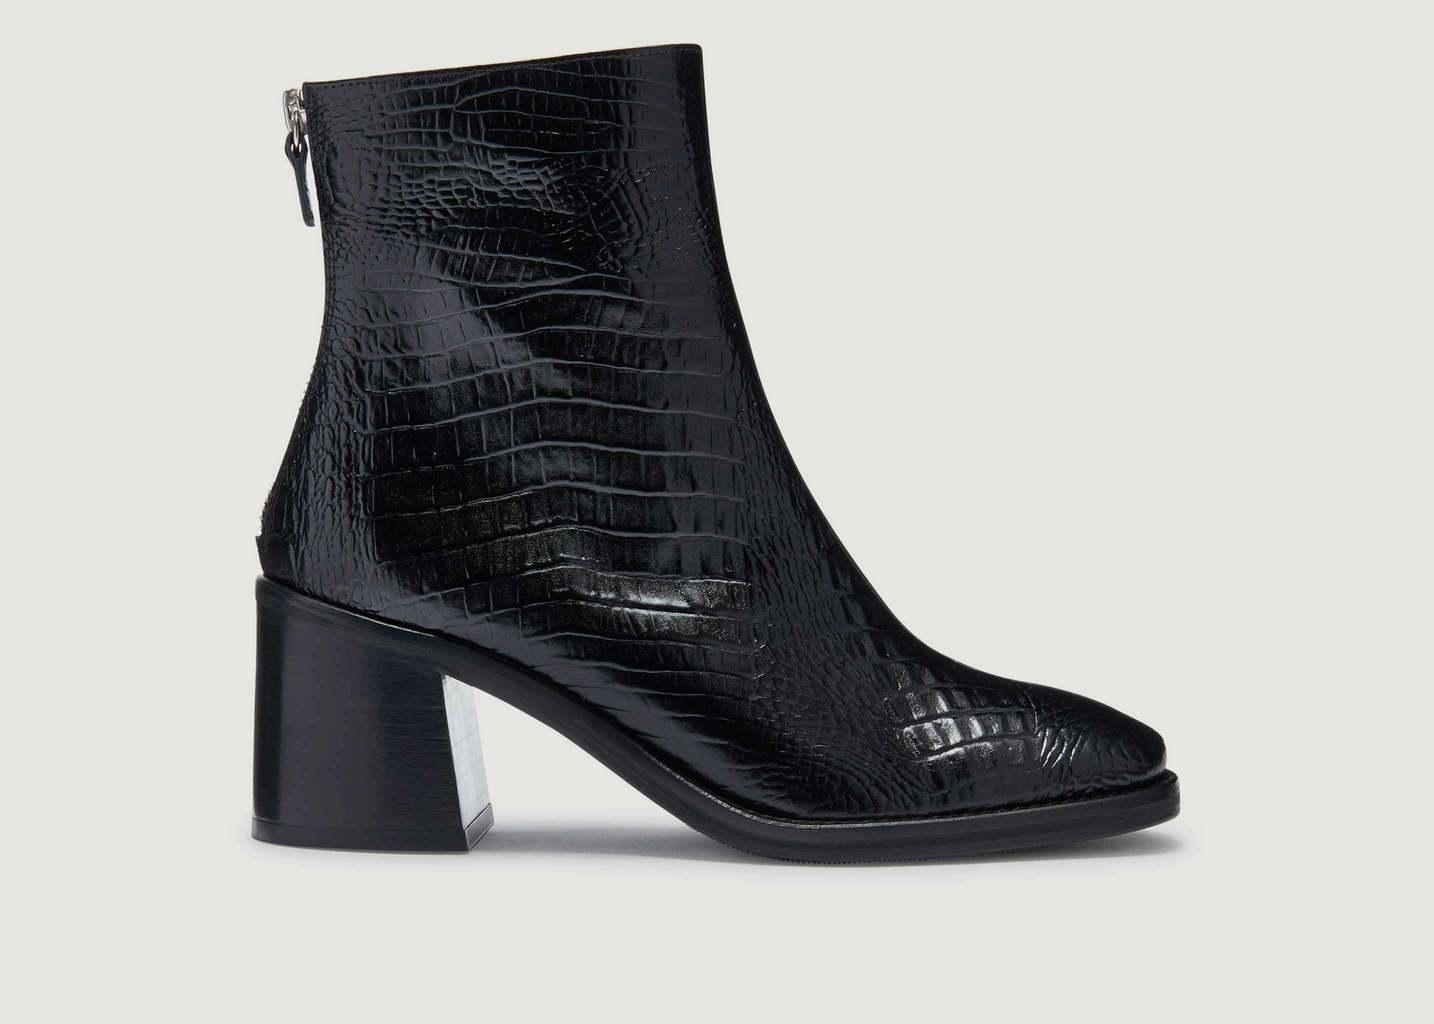 Bottines Cybil Black Croc Glossy - Miista